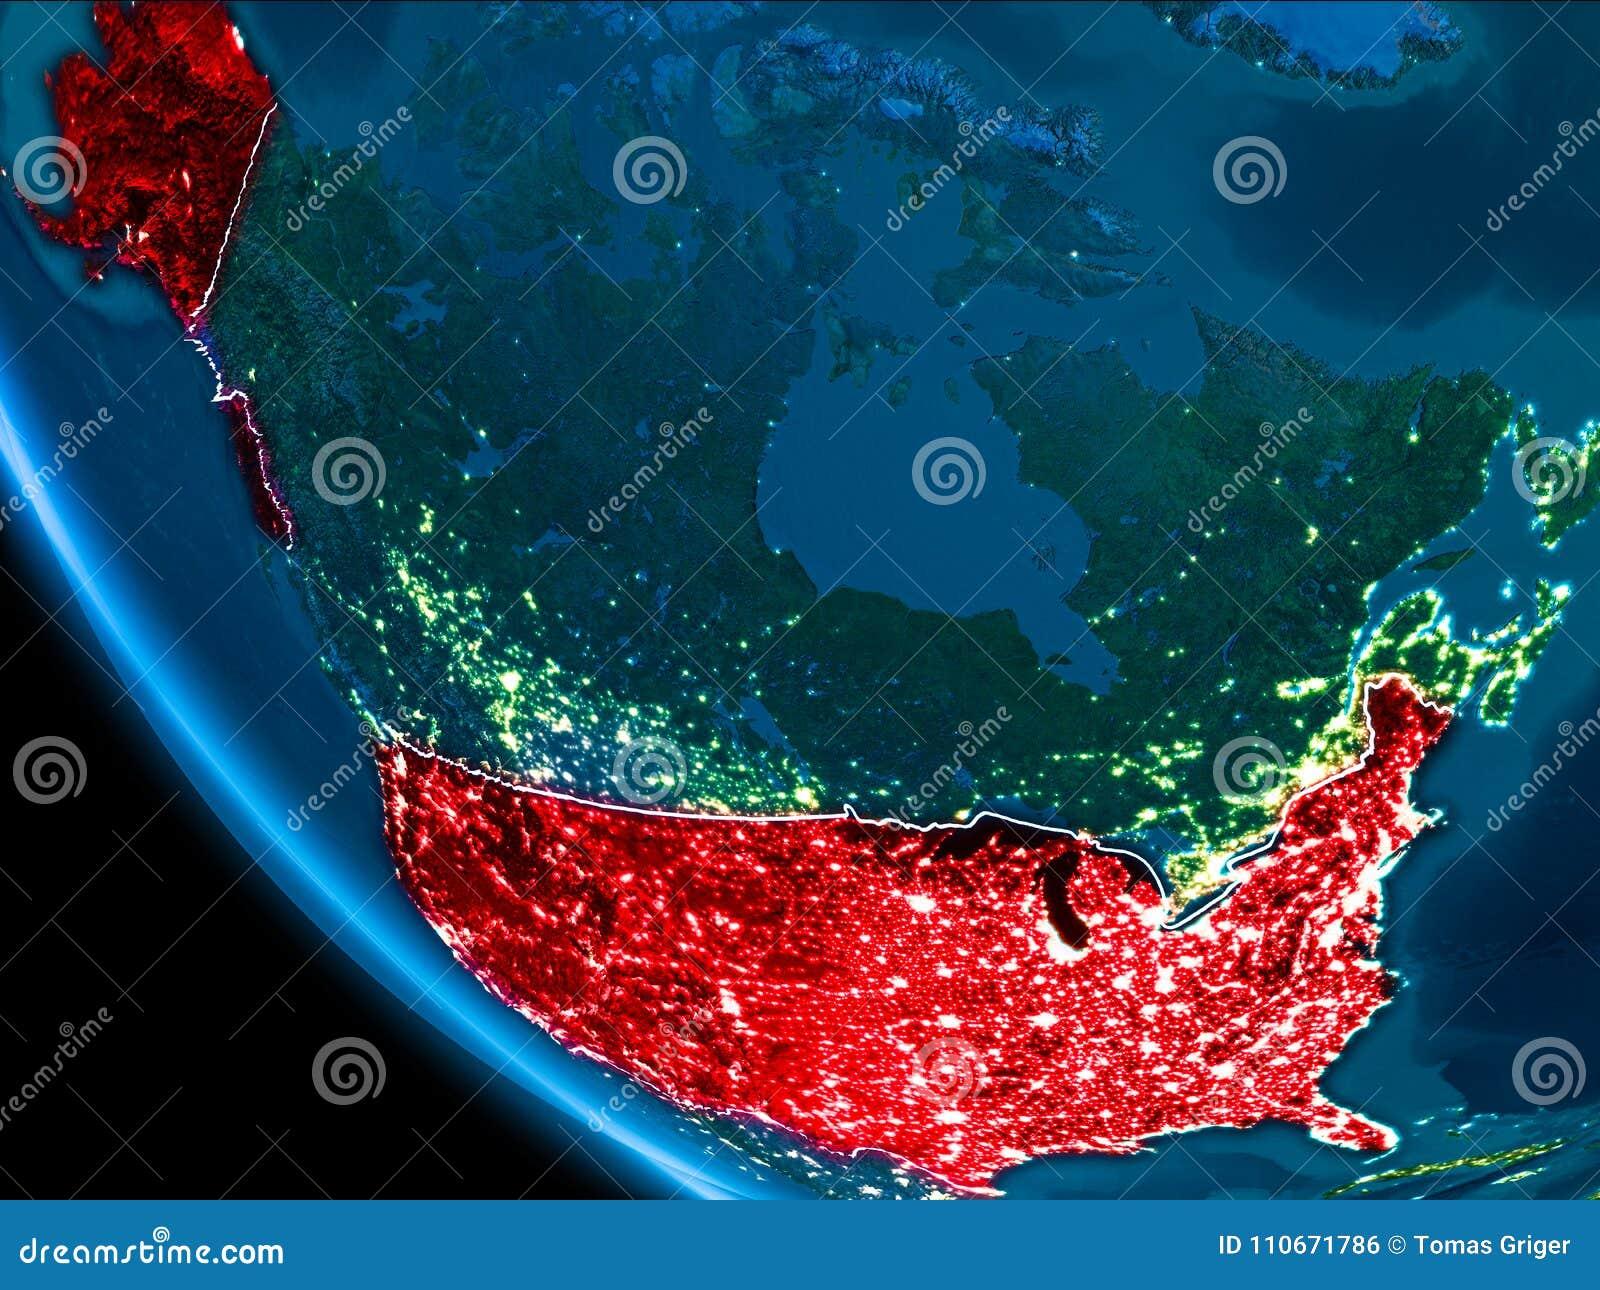 Map Of Usa At Night.Orbit View Of Usa At Night Stock Illustration Illustration Of City